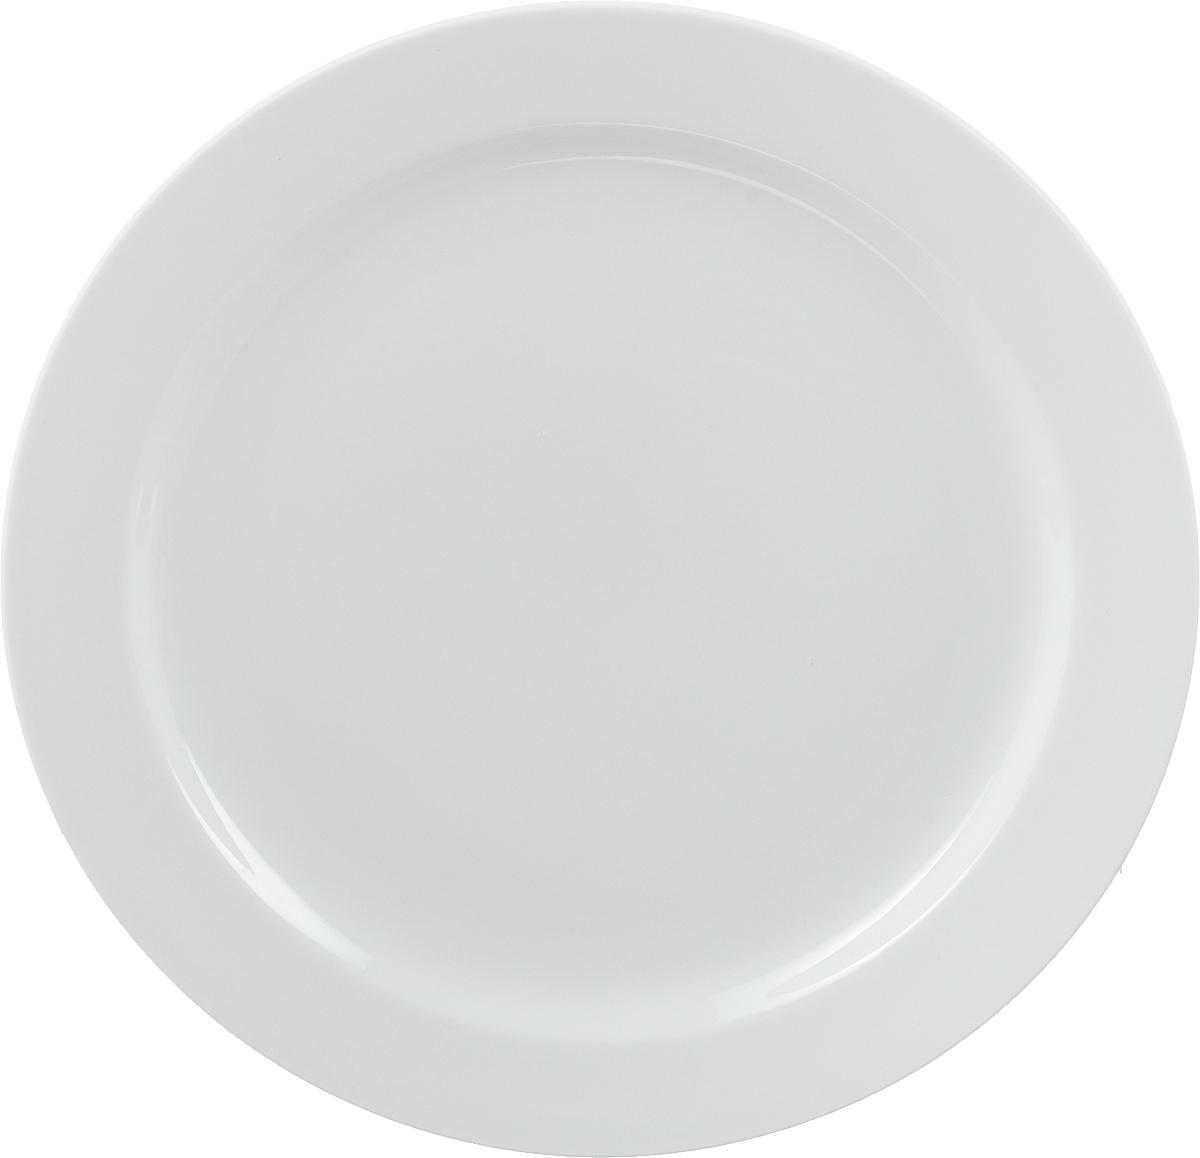 Тарелка мелкая Ariane Прайм, диаметр 27 см